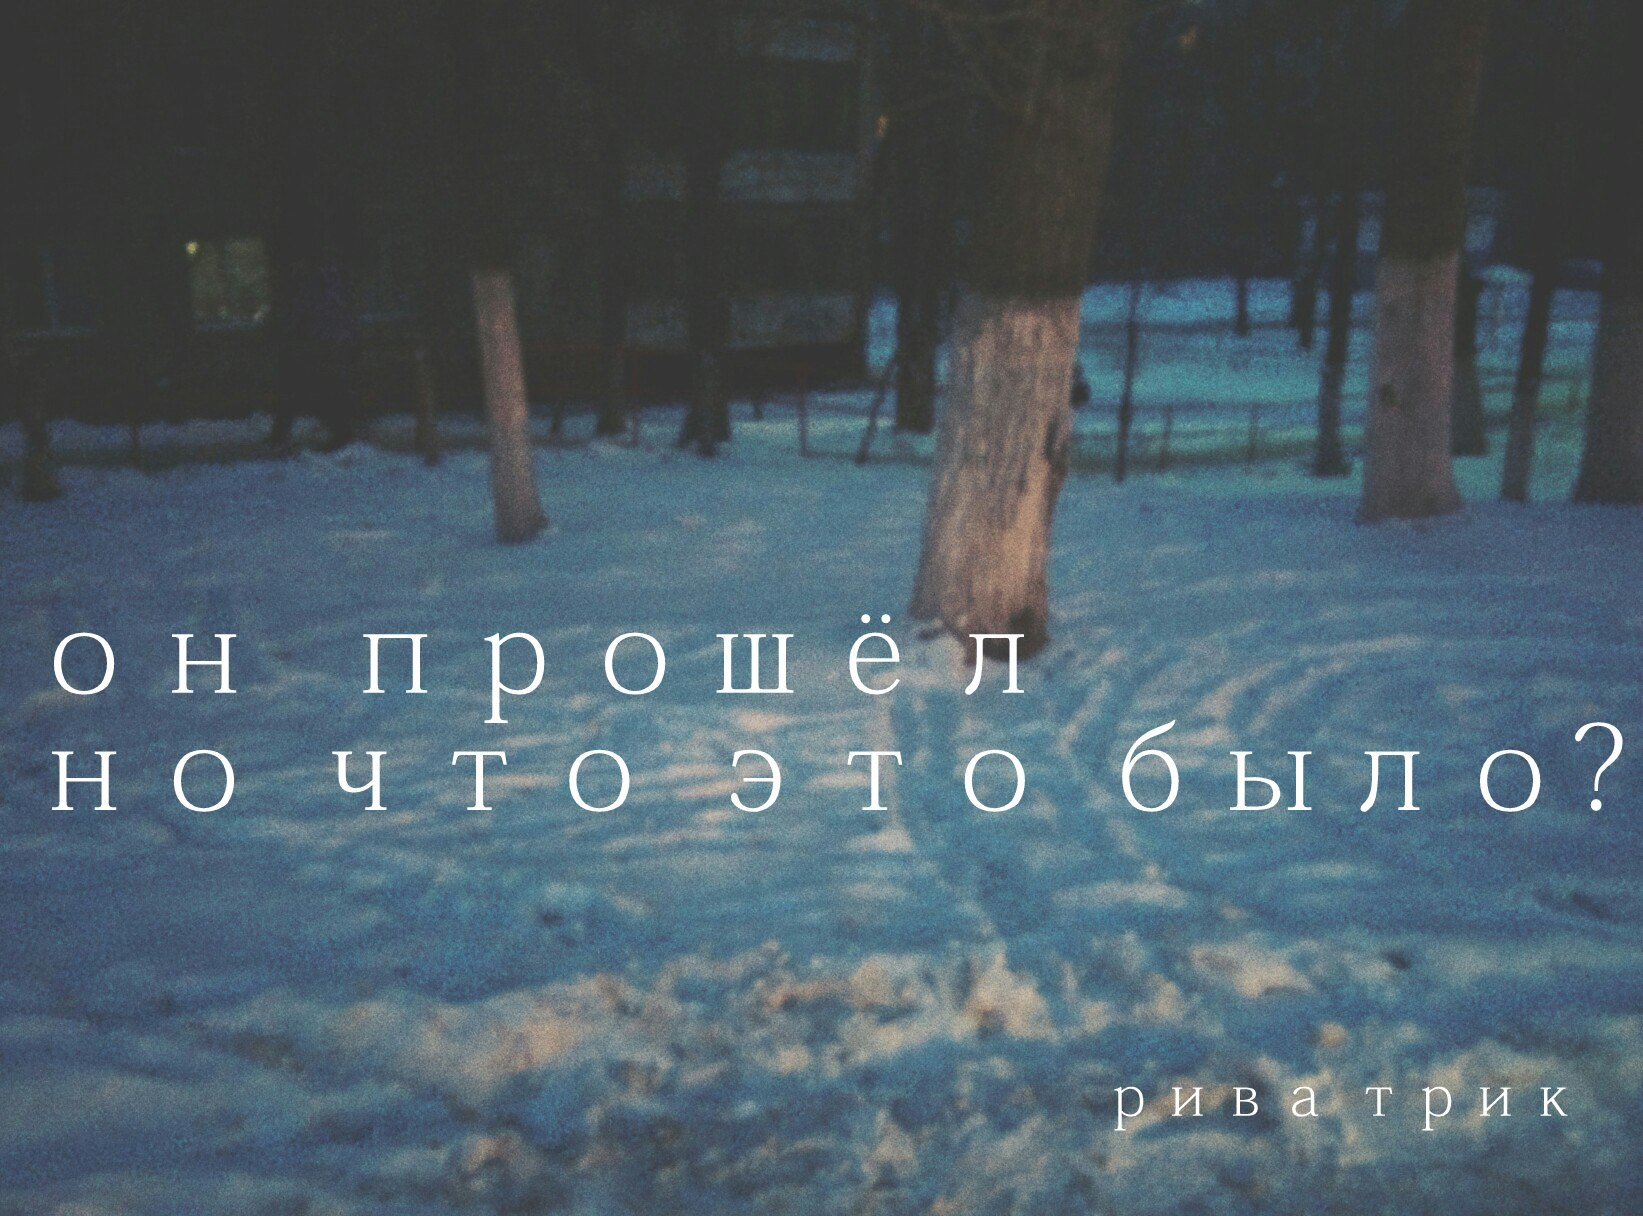 uDHu4-ZPlxo.jpg